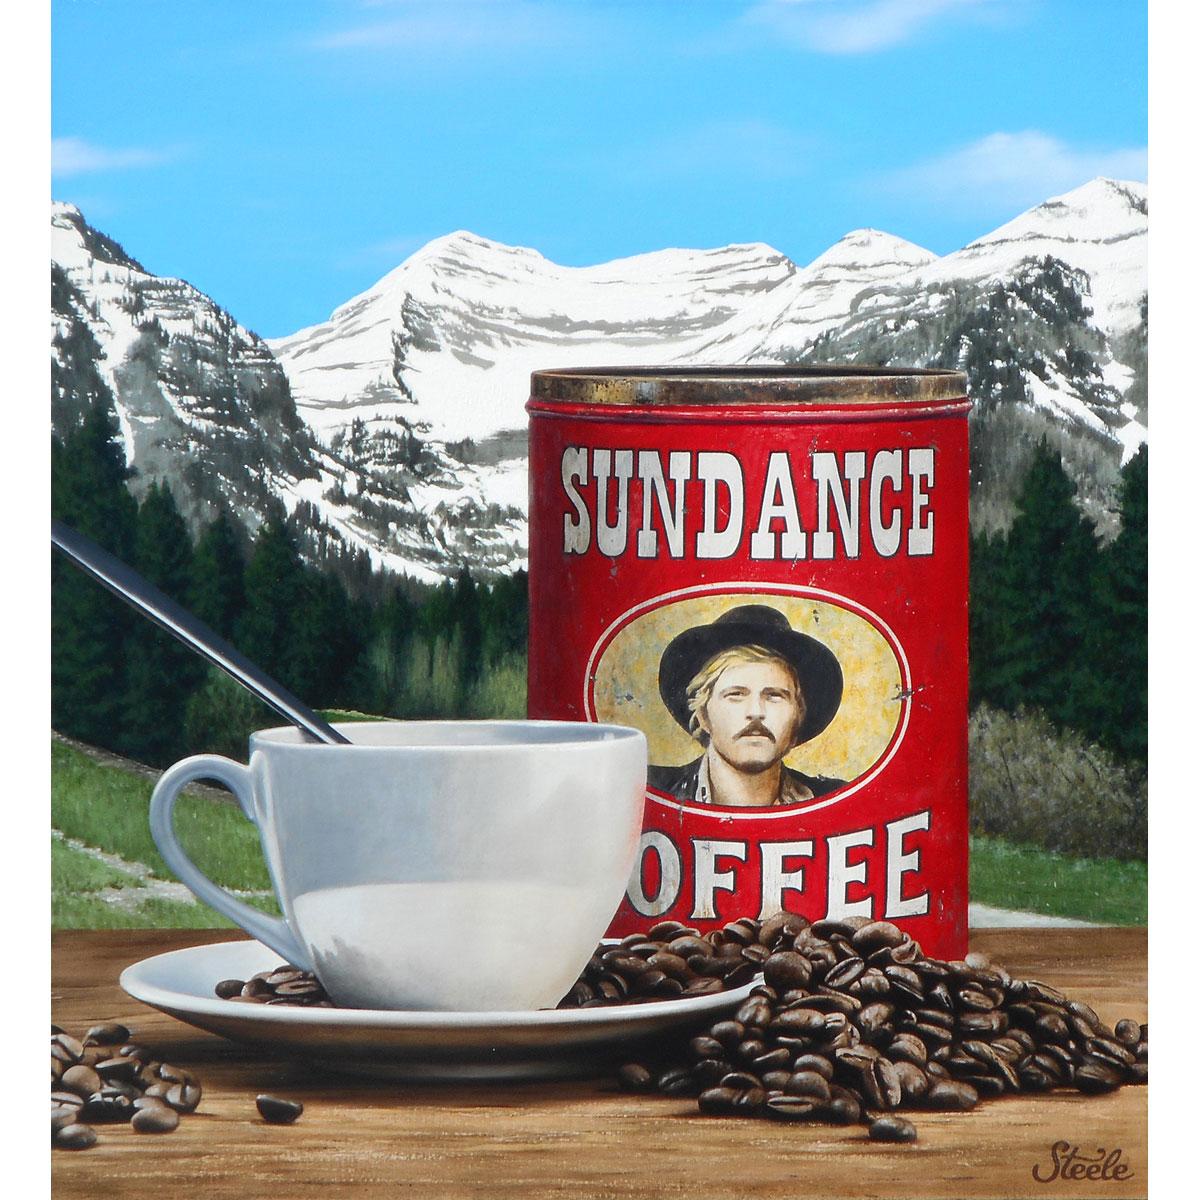 Sundance Coffee by Ben Steele